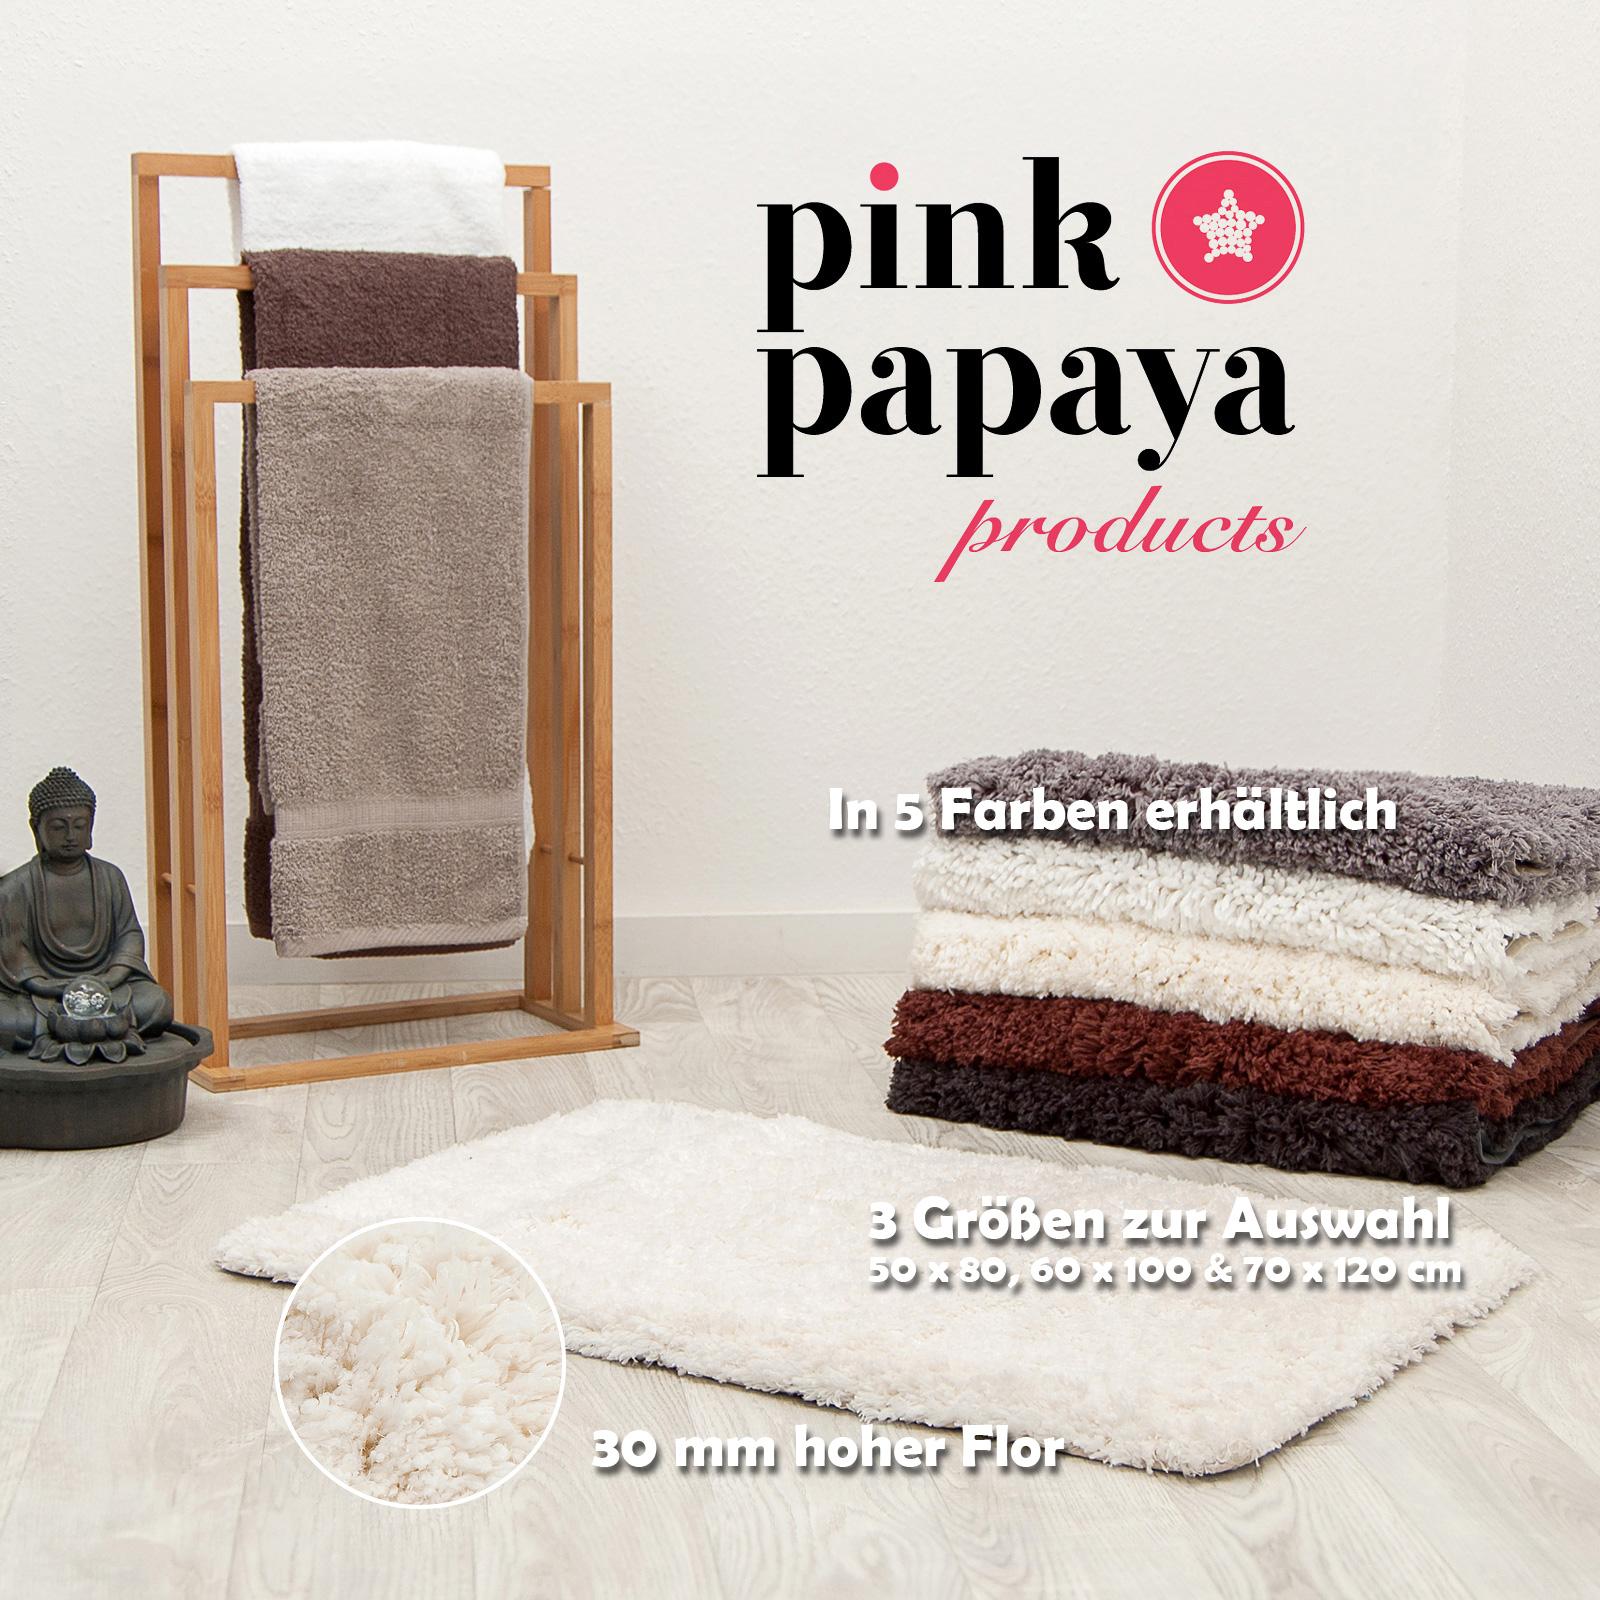 pink papaya hochflor luxus badteppich cloud 70 x 120 cm beige ebay. Black Bedroom Furniture Sets. Home Design Ideas